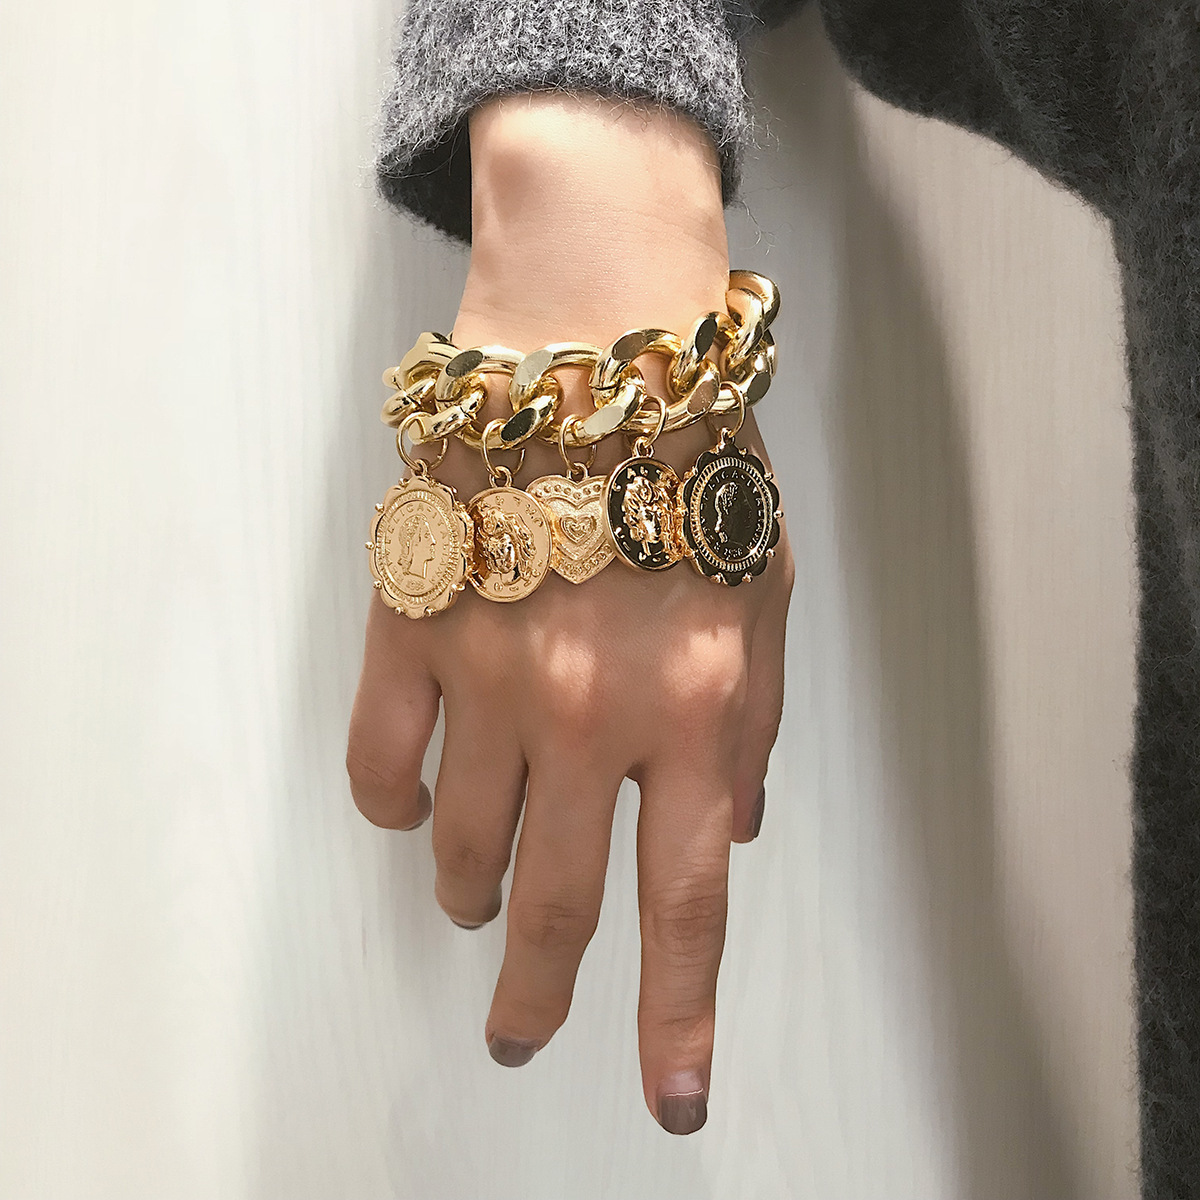 KingDeng Big Gold Bracket Punk Chain Coins Retro Jewelry Female Personality Relief Portrait Geometric Bracelets HipHop 2019 Man